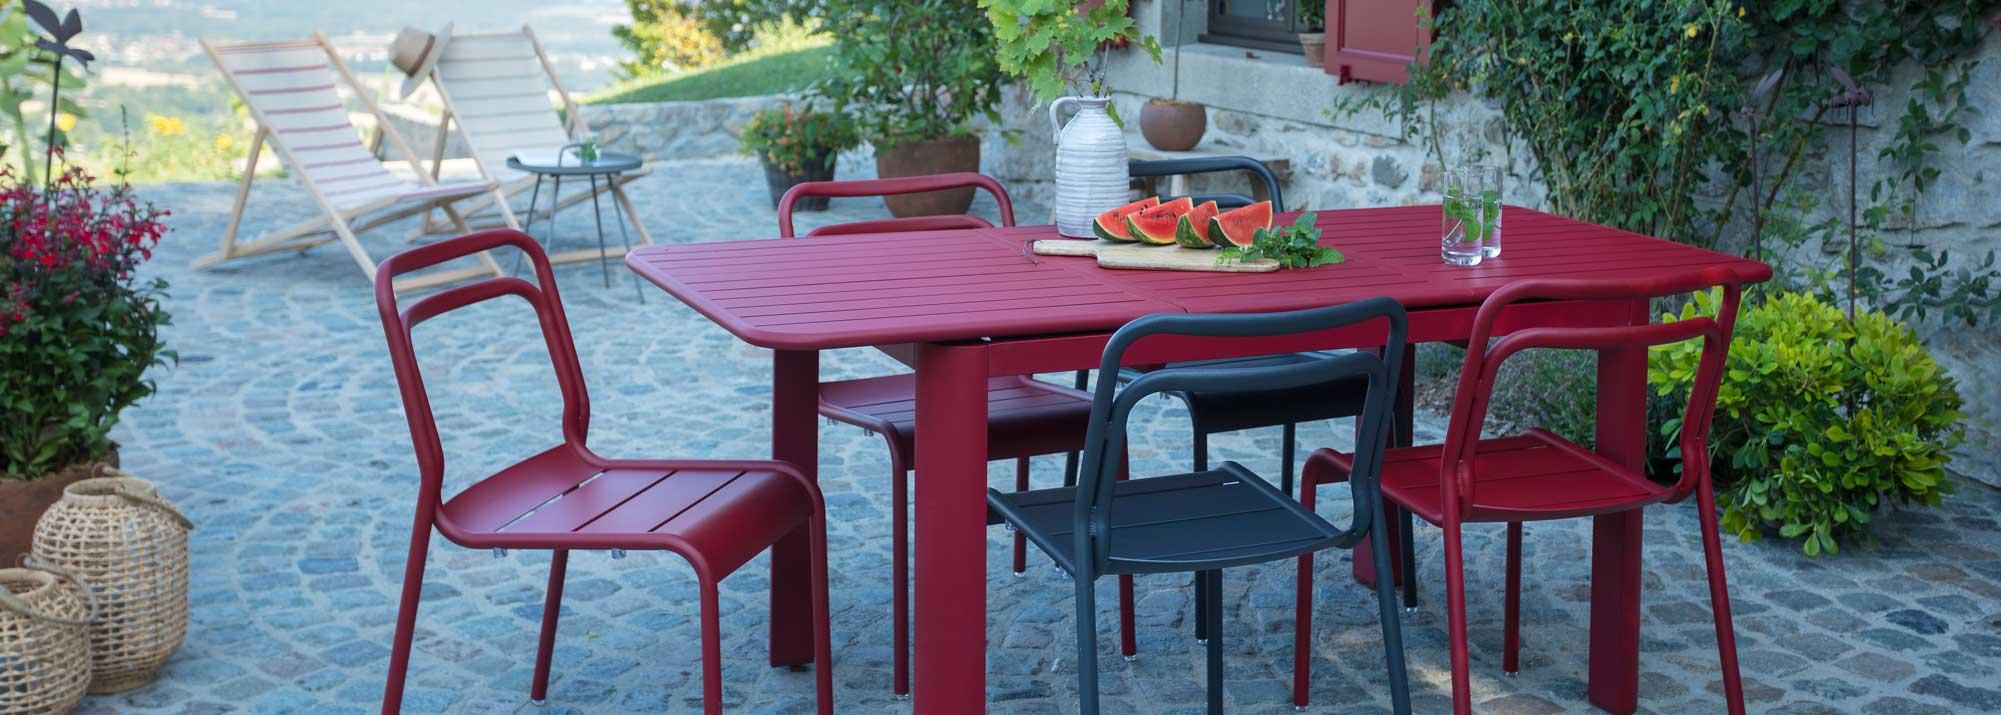 Table De Jardin : Botanic®, Tables De Jardin En Aluminium ... avec Salon De Jardin En Metal De Couleur